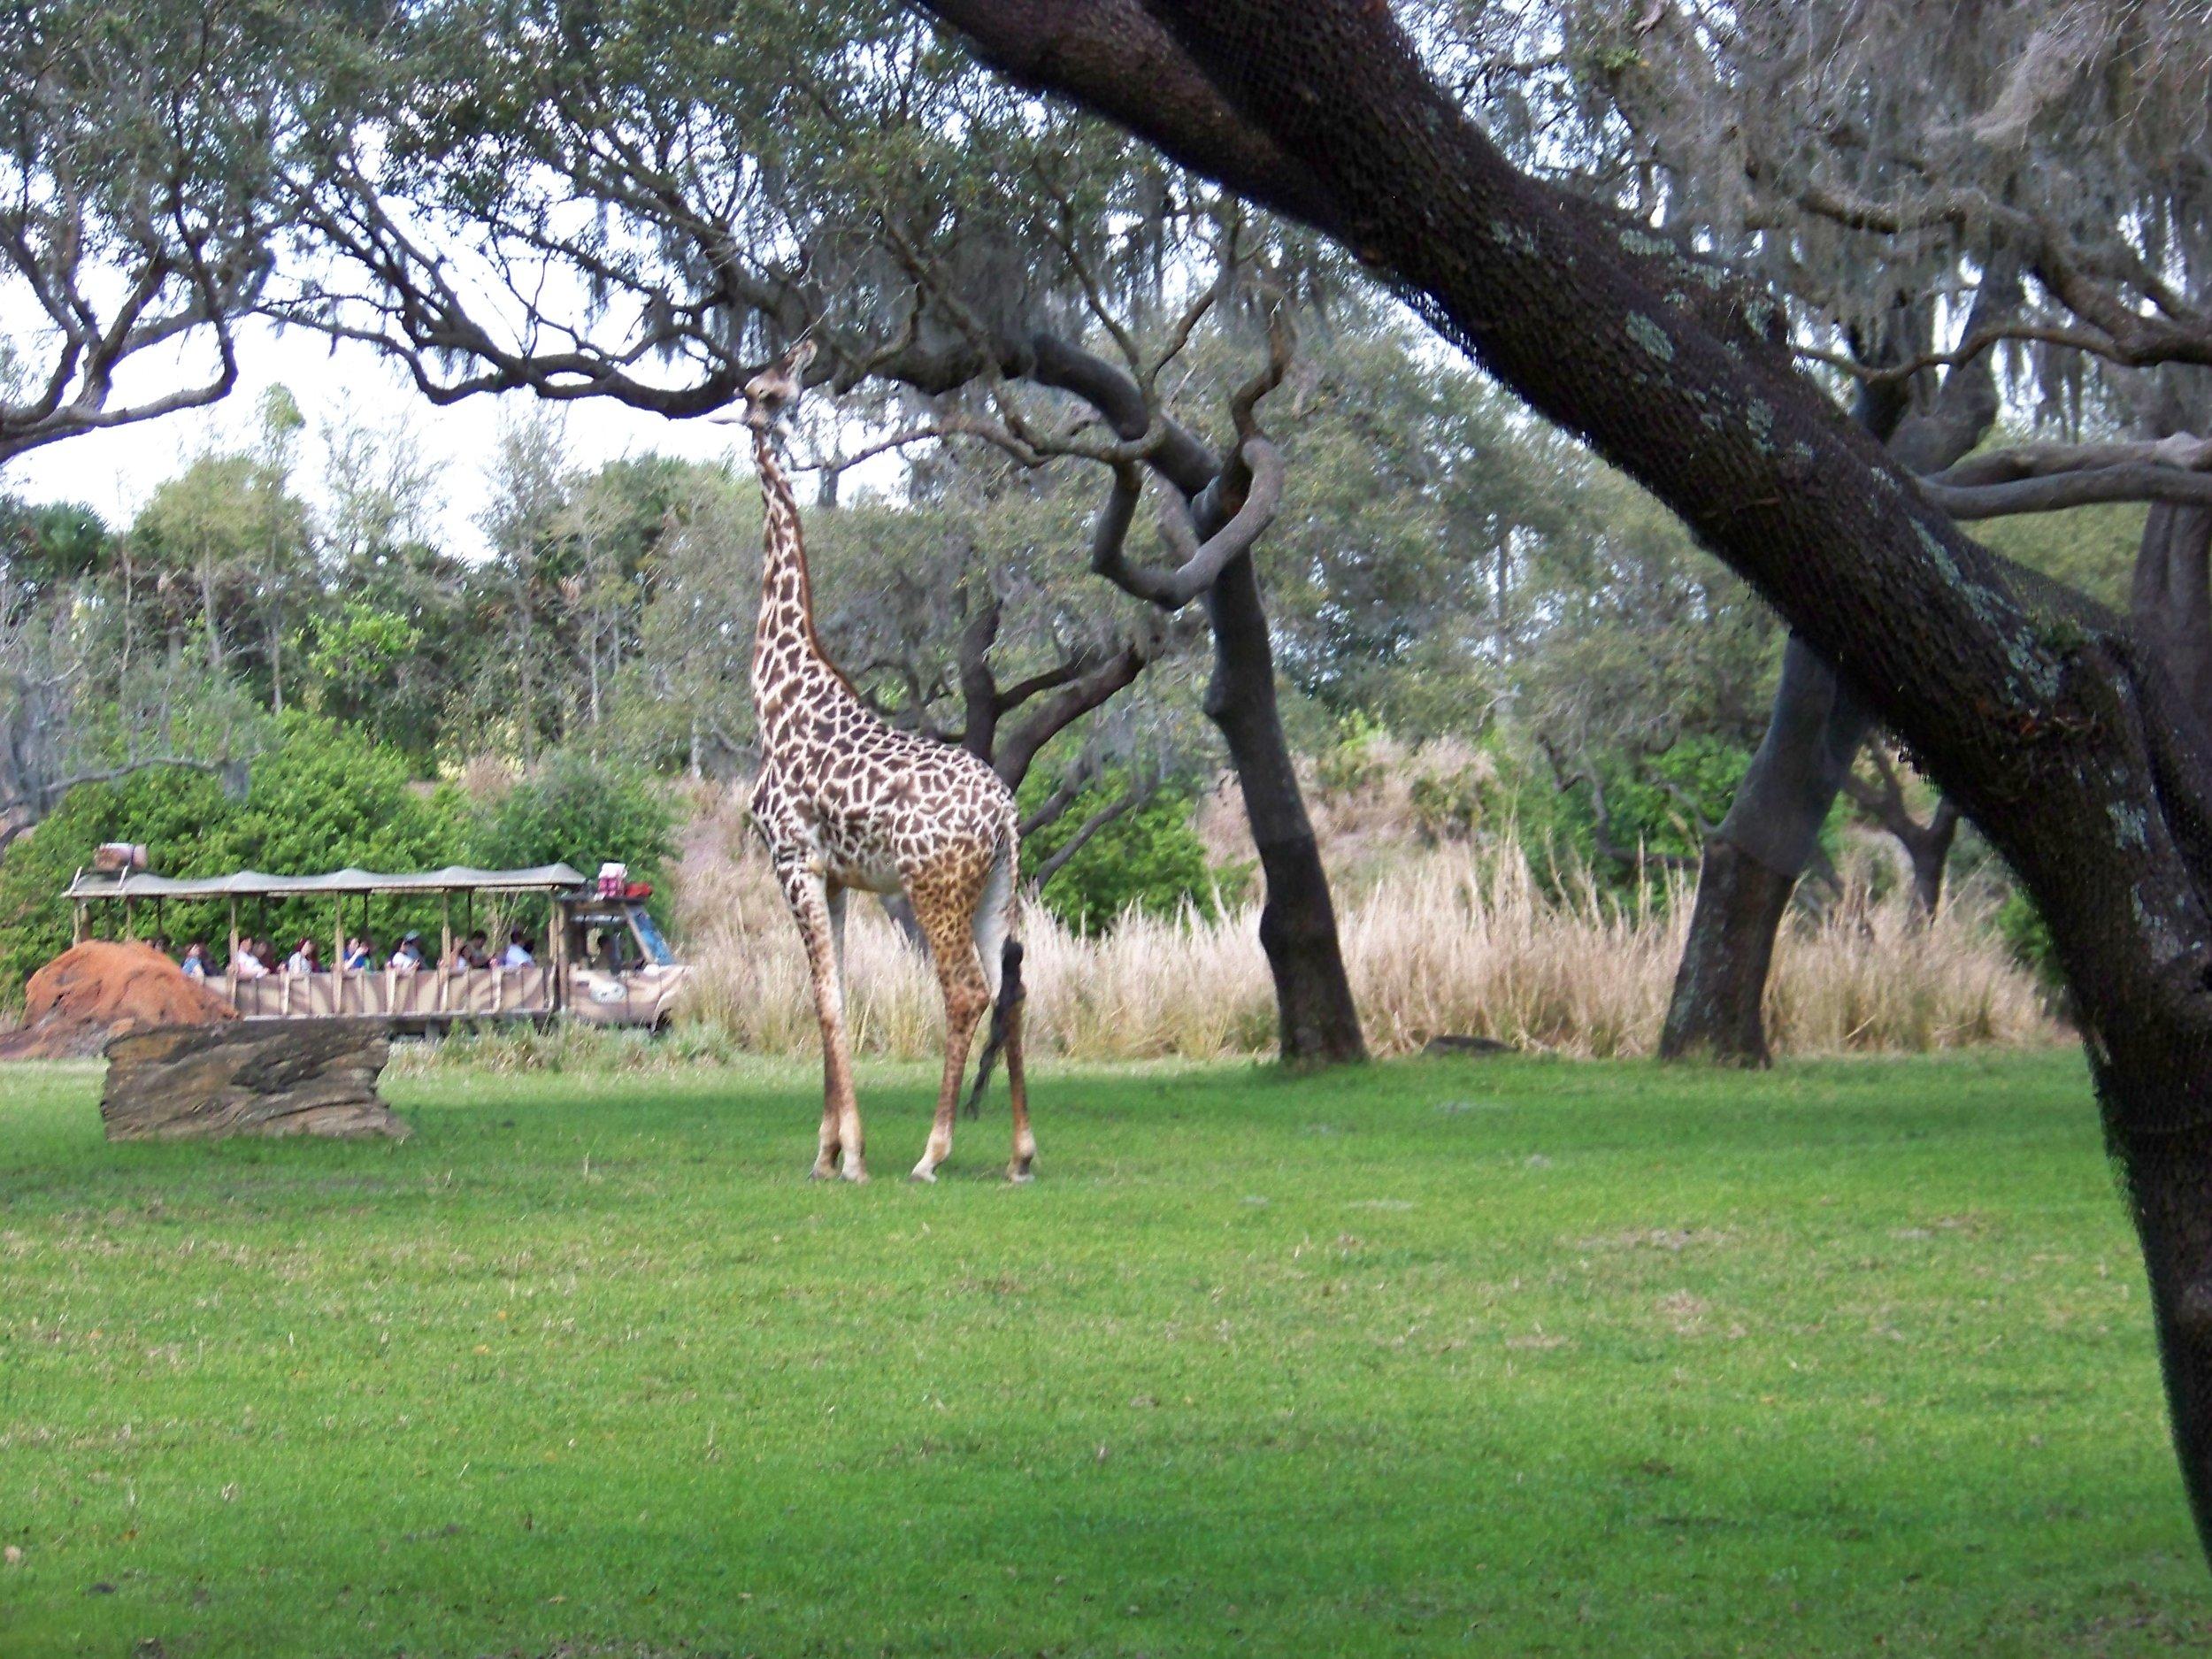 Kilimanjaro Safaris, Africa, Disney's Animal Kingdom